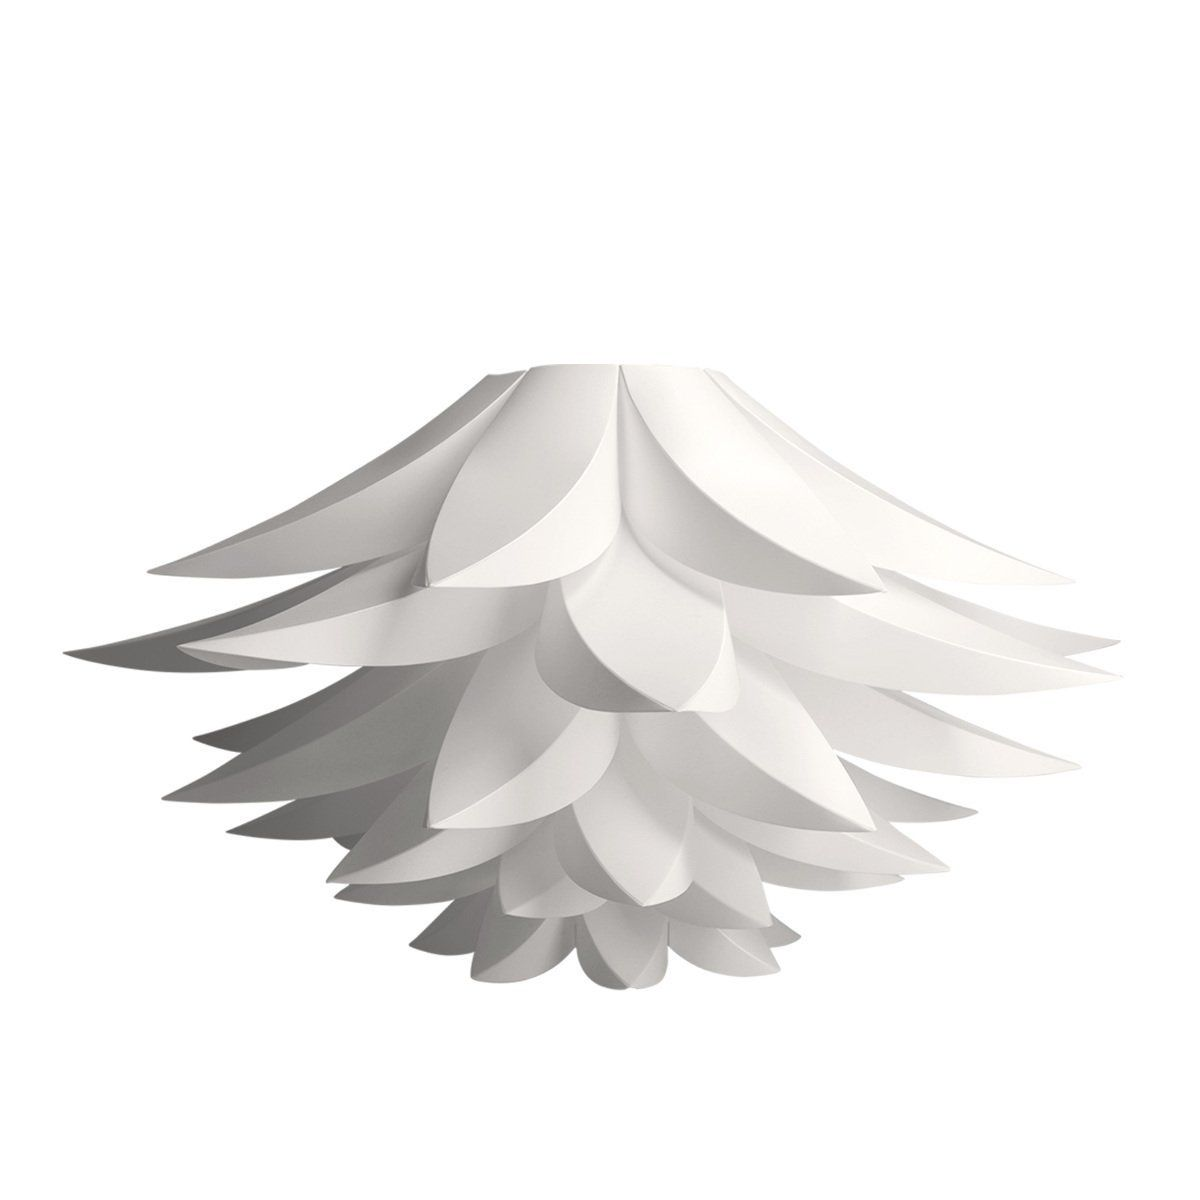 Kwmobile Puzzle Lotus Lamp Diy White Flower Light Design Lampshade